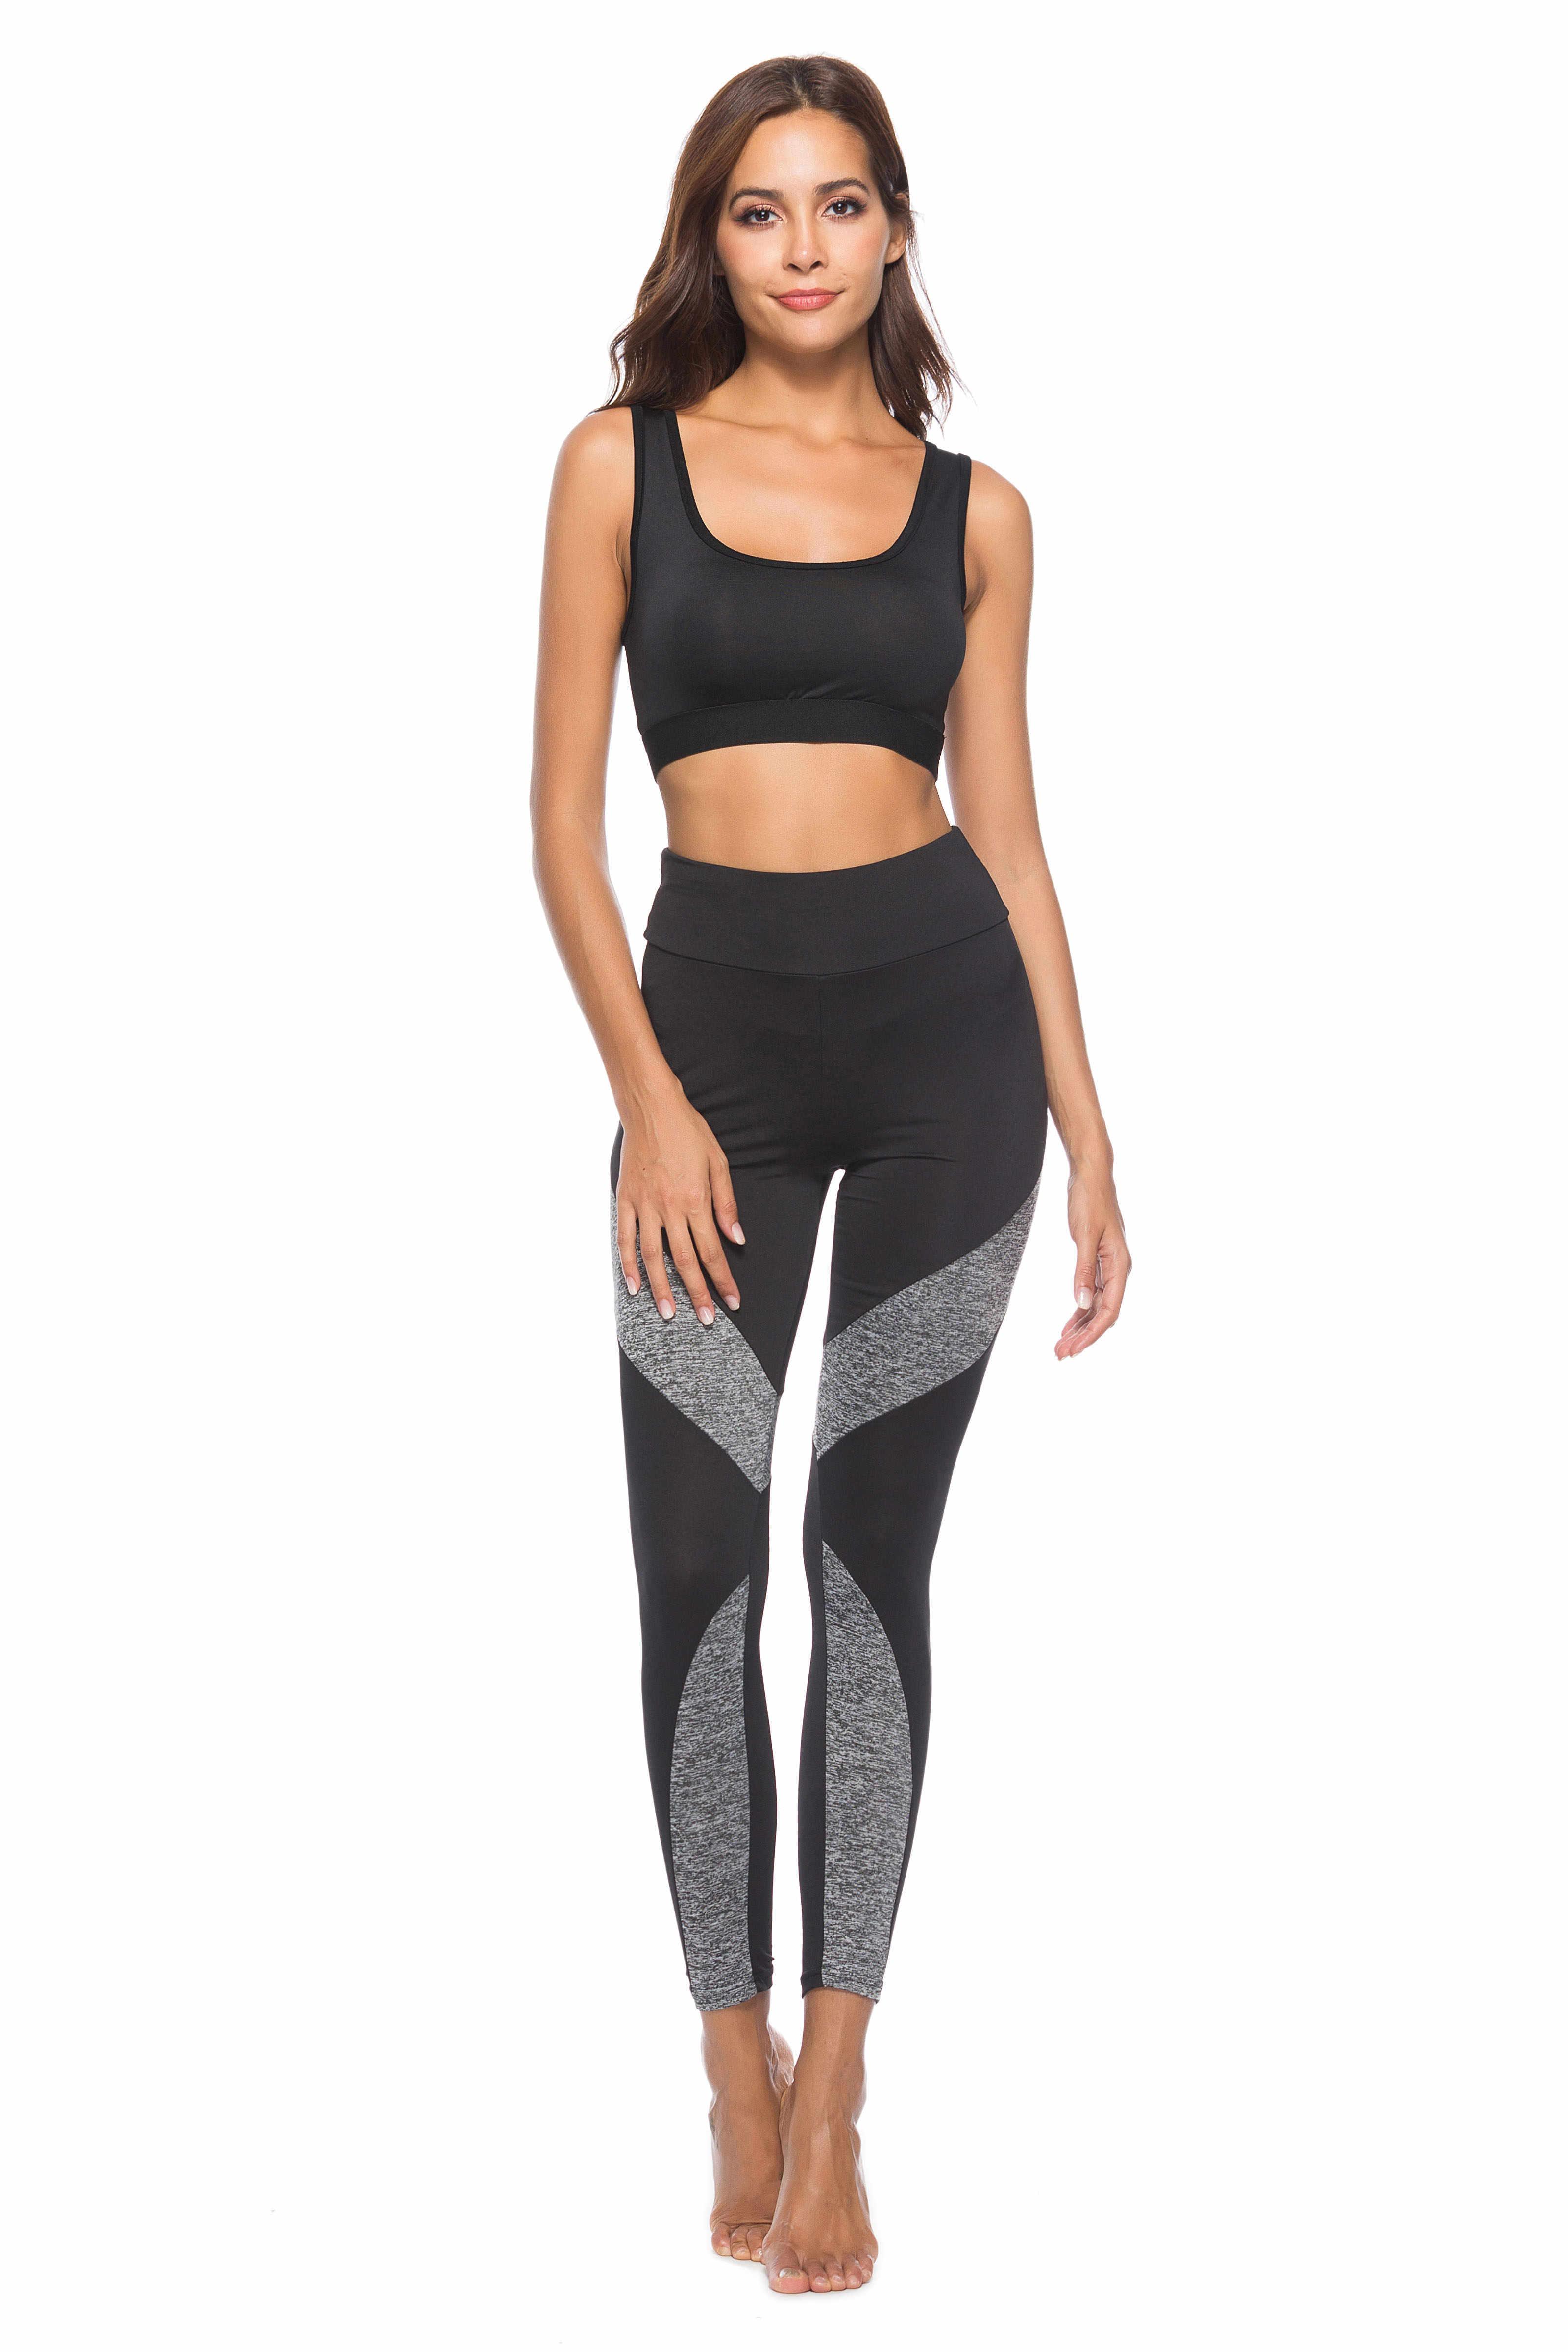 Damskie Sexy szwy legginsy kobiety legging łokcie dla Fitness legginsy Push Up Jeggings Workout Tayt Sportleggings spodnie